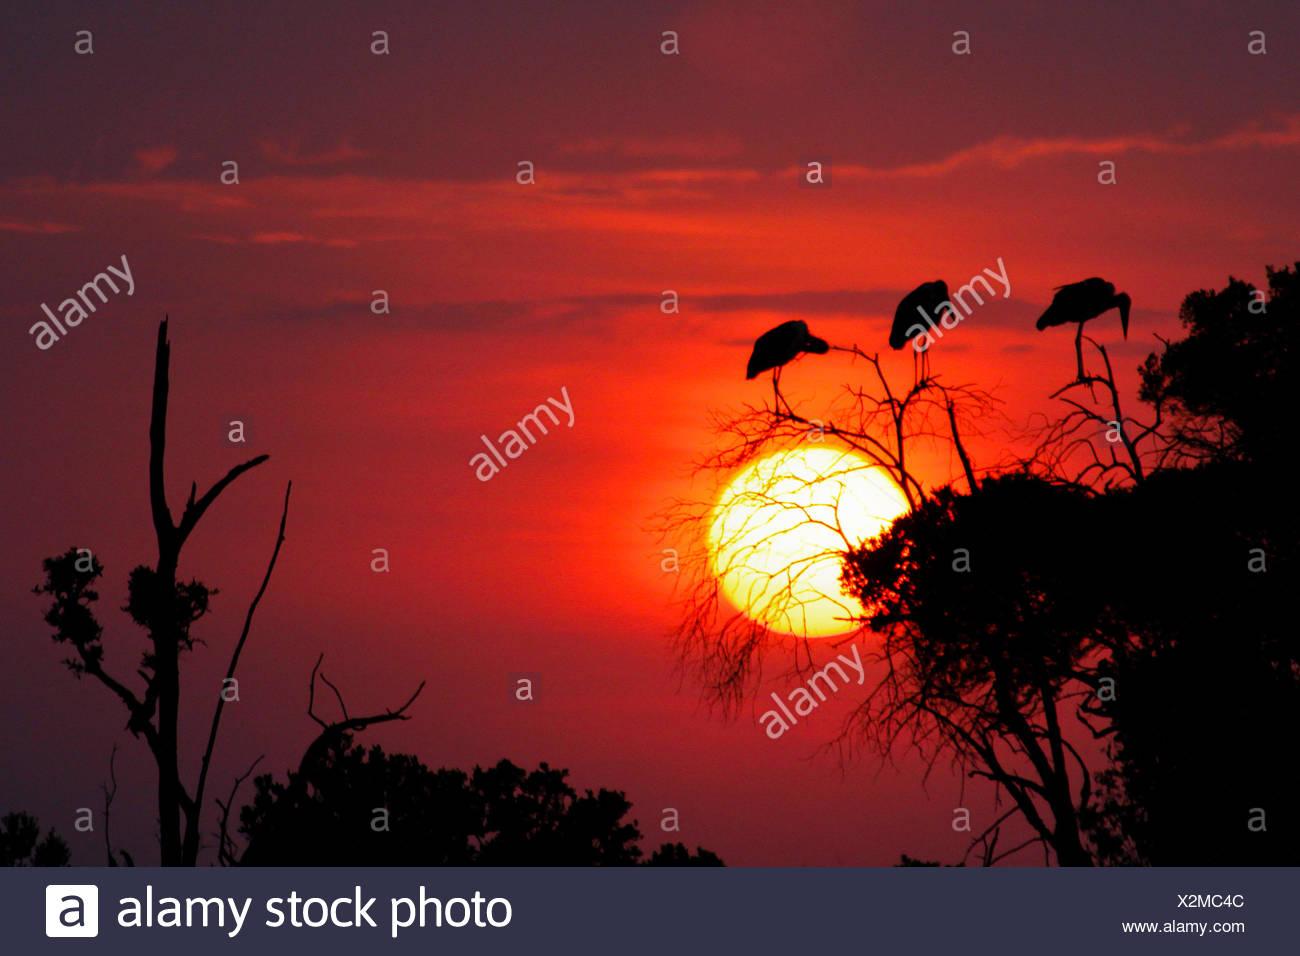 Kenya, Narok, Masai Mara National Park, African sunset landscape - Stock Image